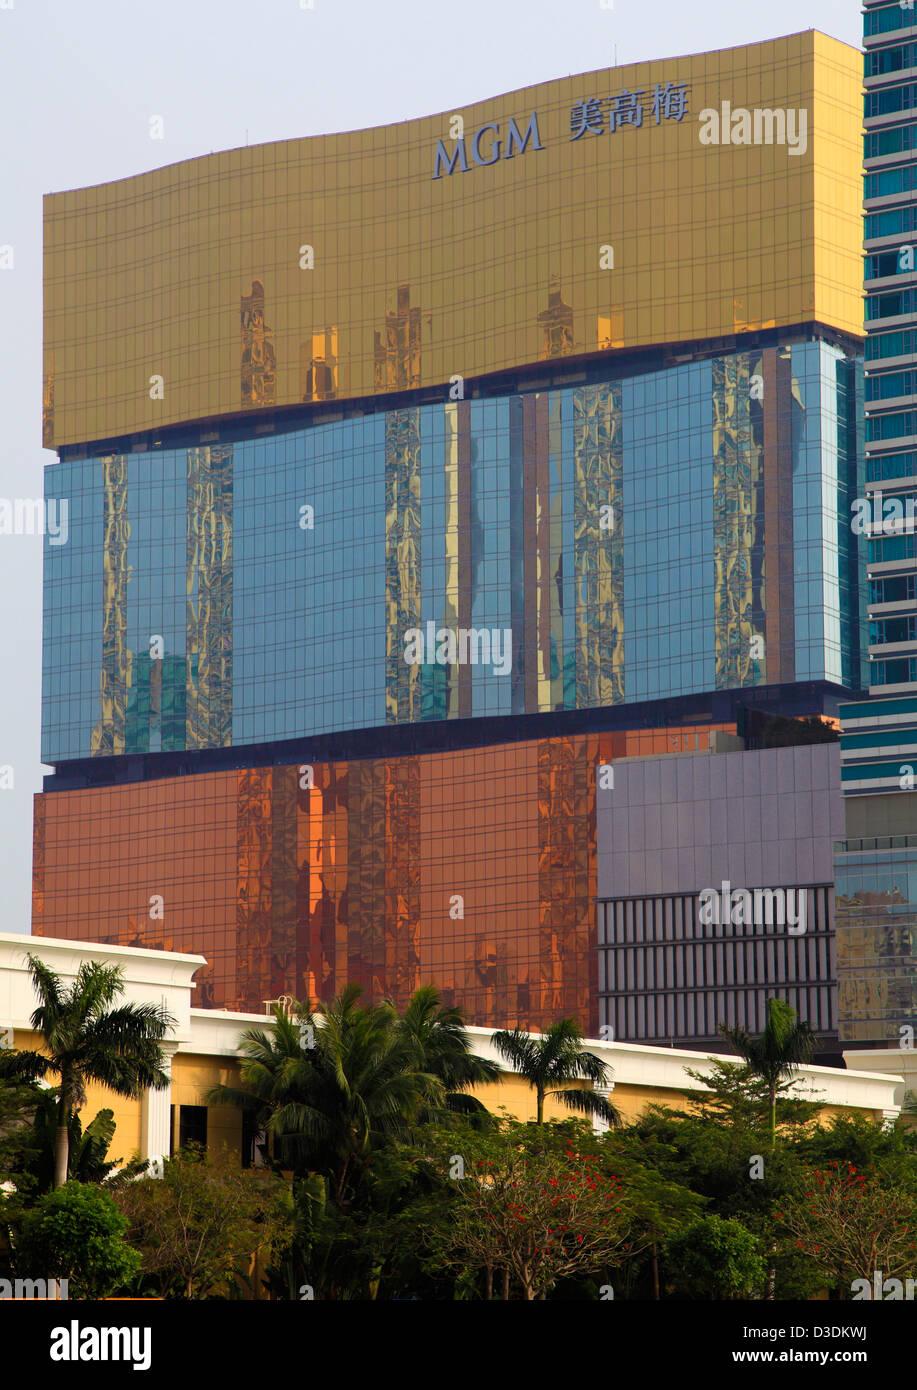 China, Macau, MGM Grand, hotel, casino, - Stock Image